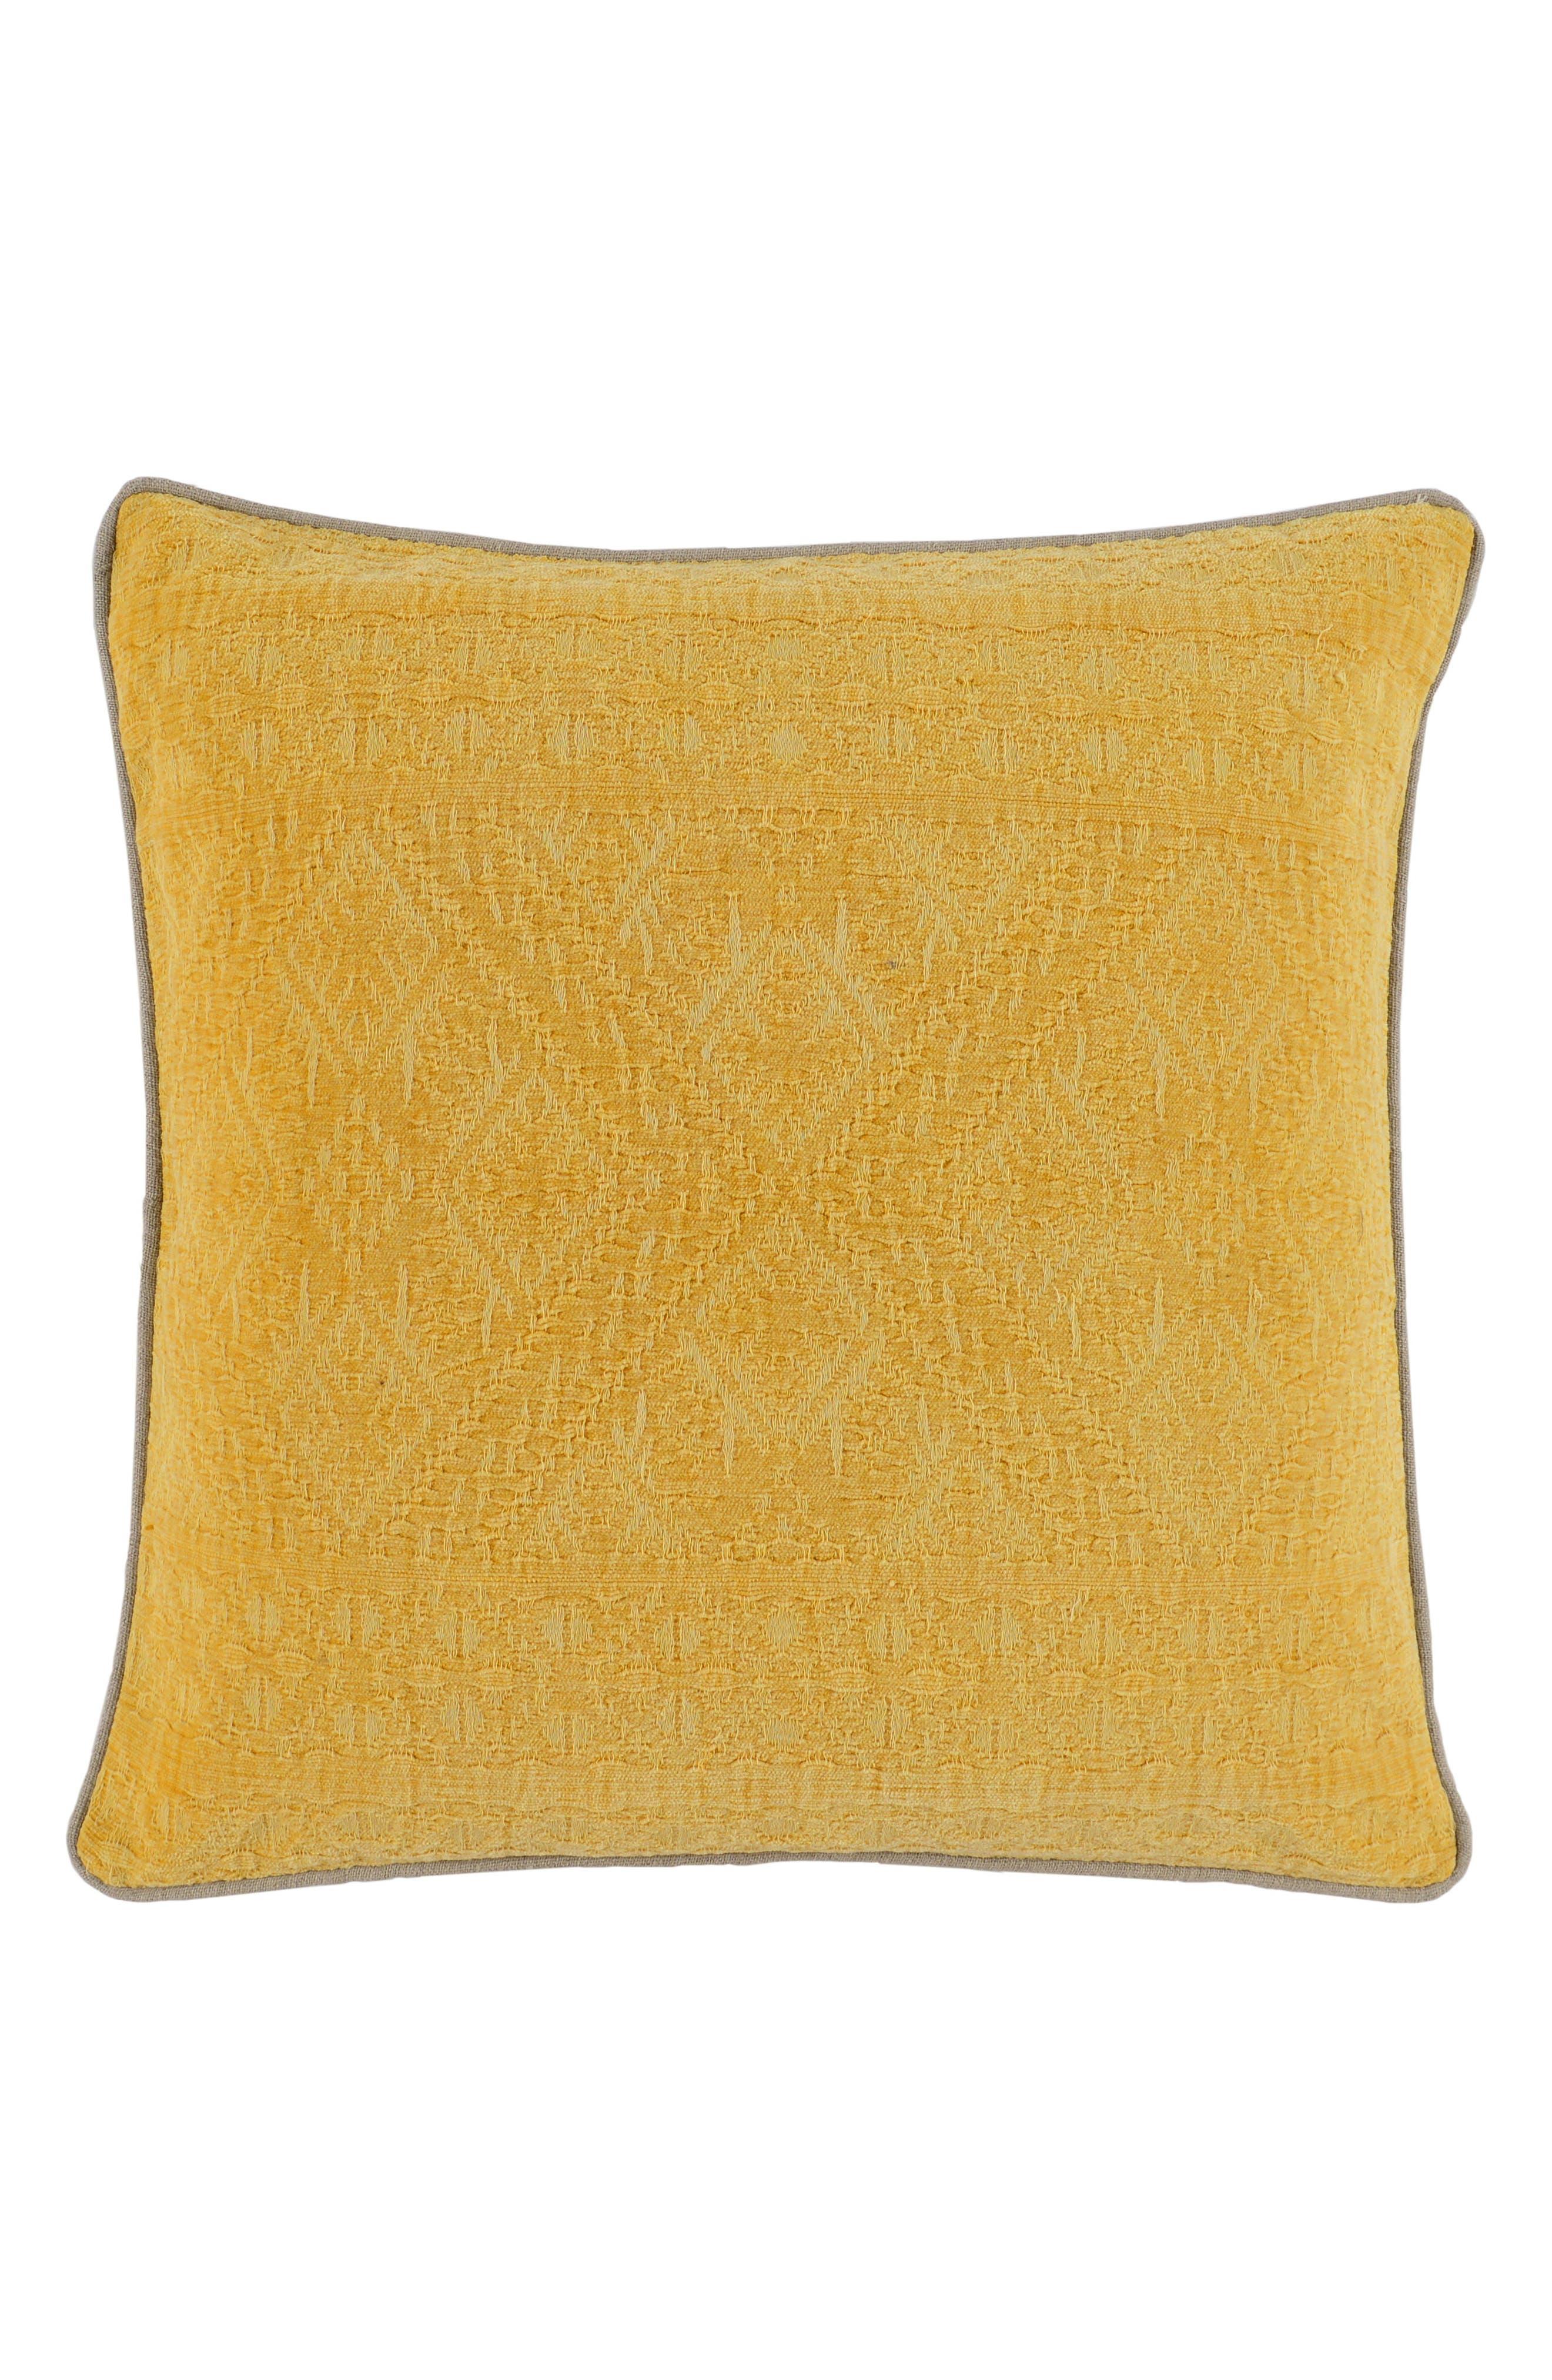 Palmer Accent Pillow,                         Main,                         color, 700